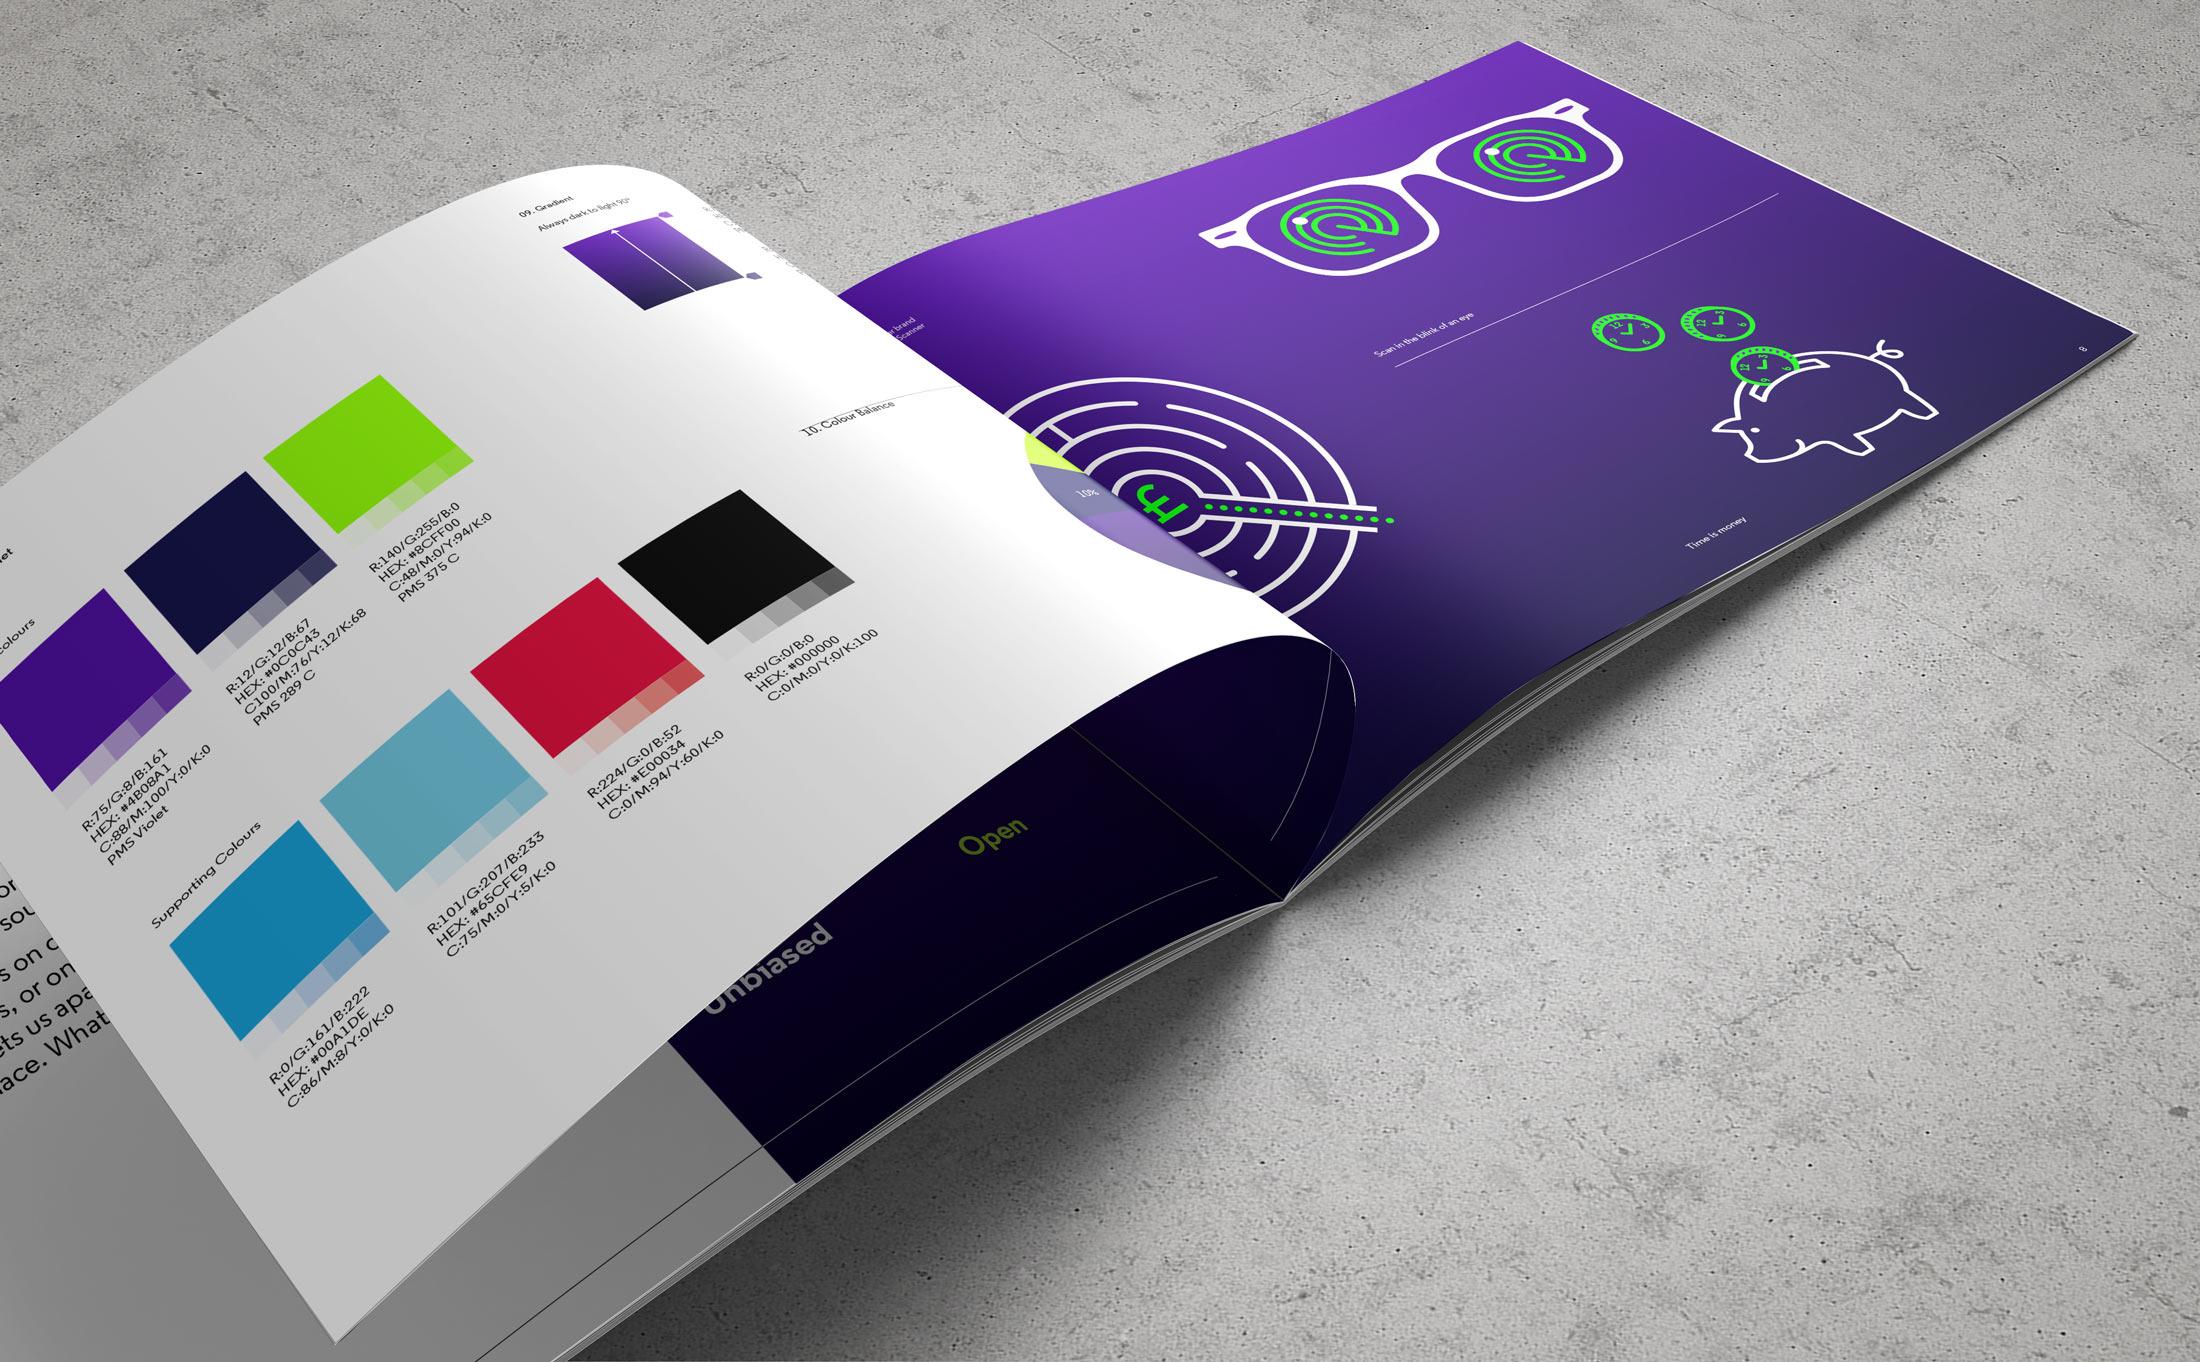 Brand identity design explained through brand guidelines document